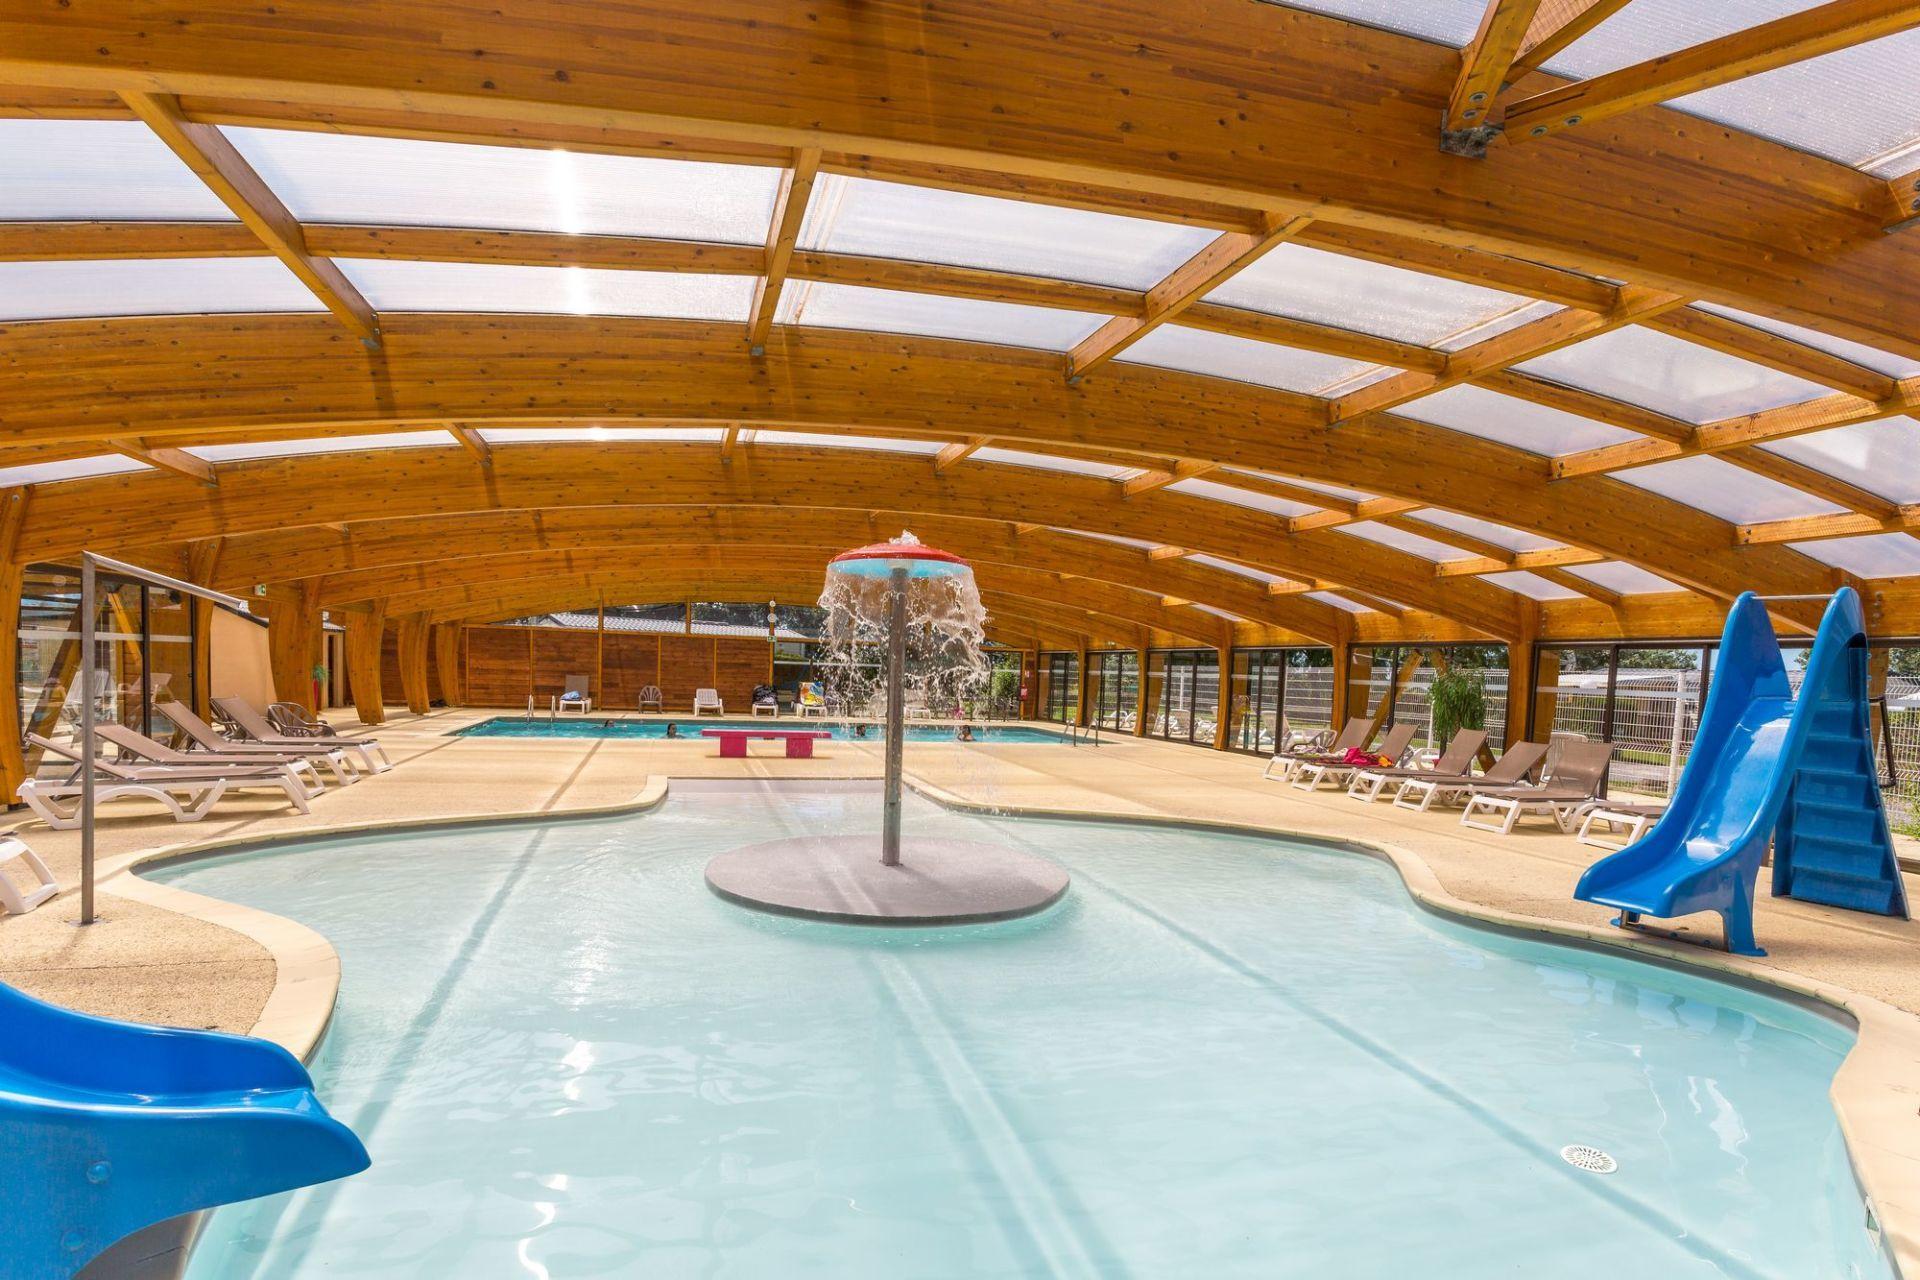 Camping le tarteron baie de somme - Camping piscine couverte baie de somme ...